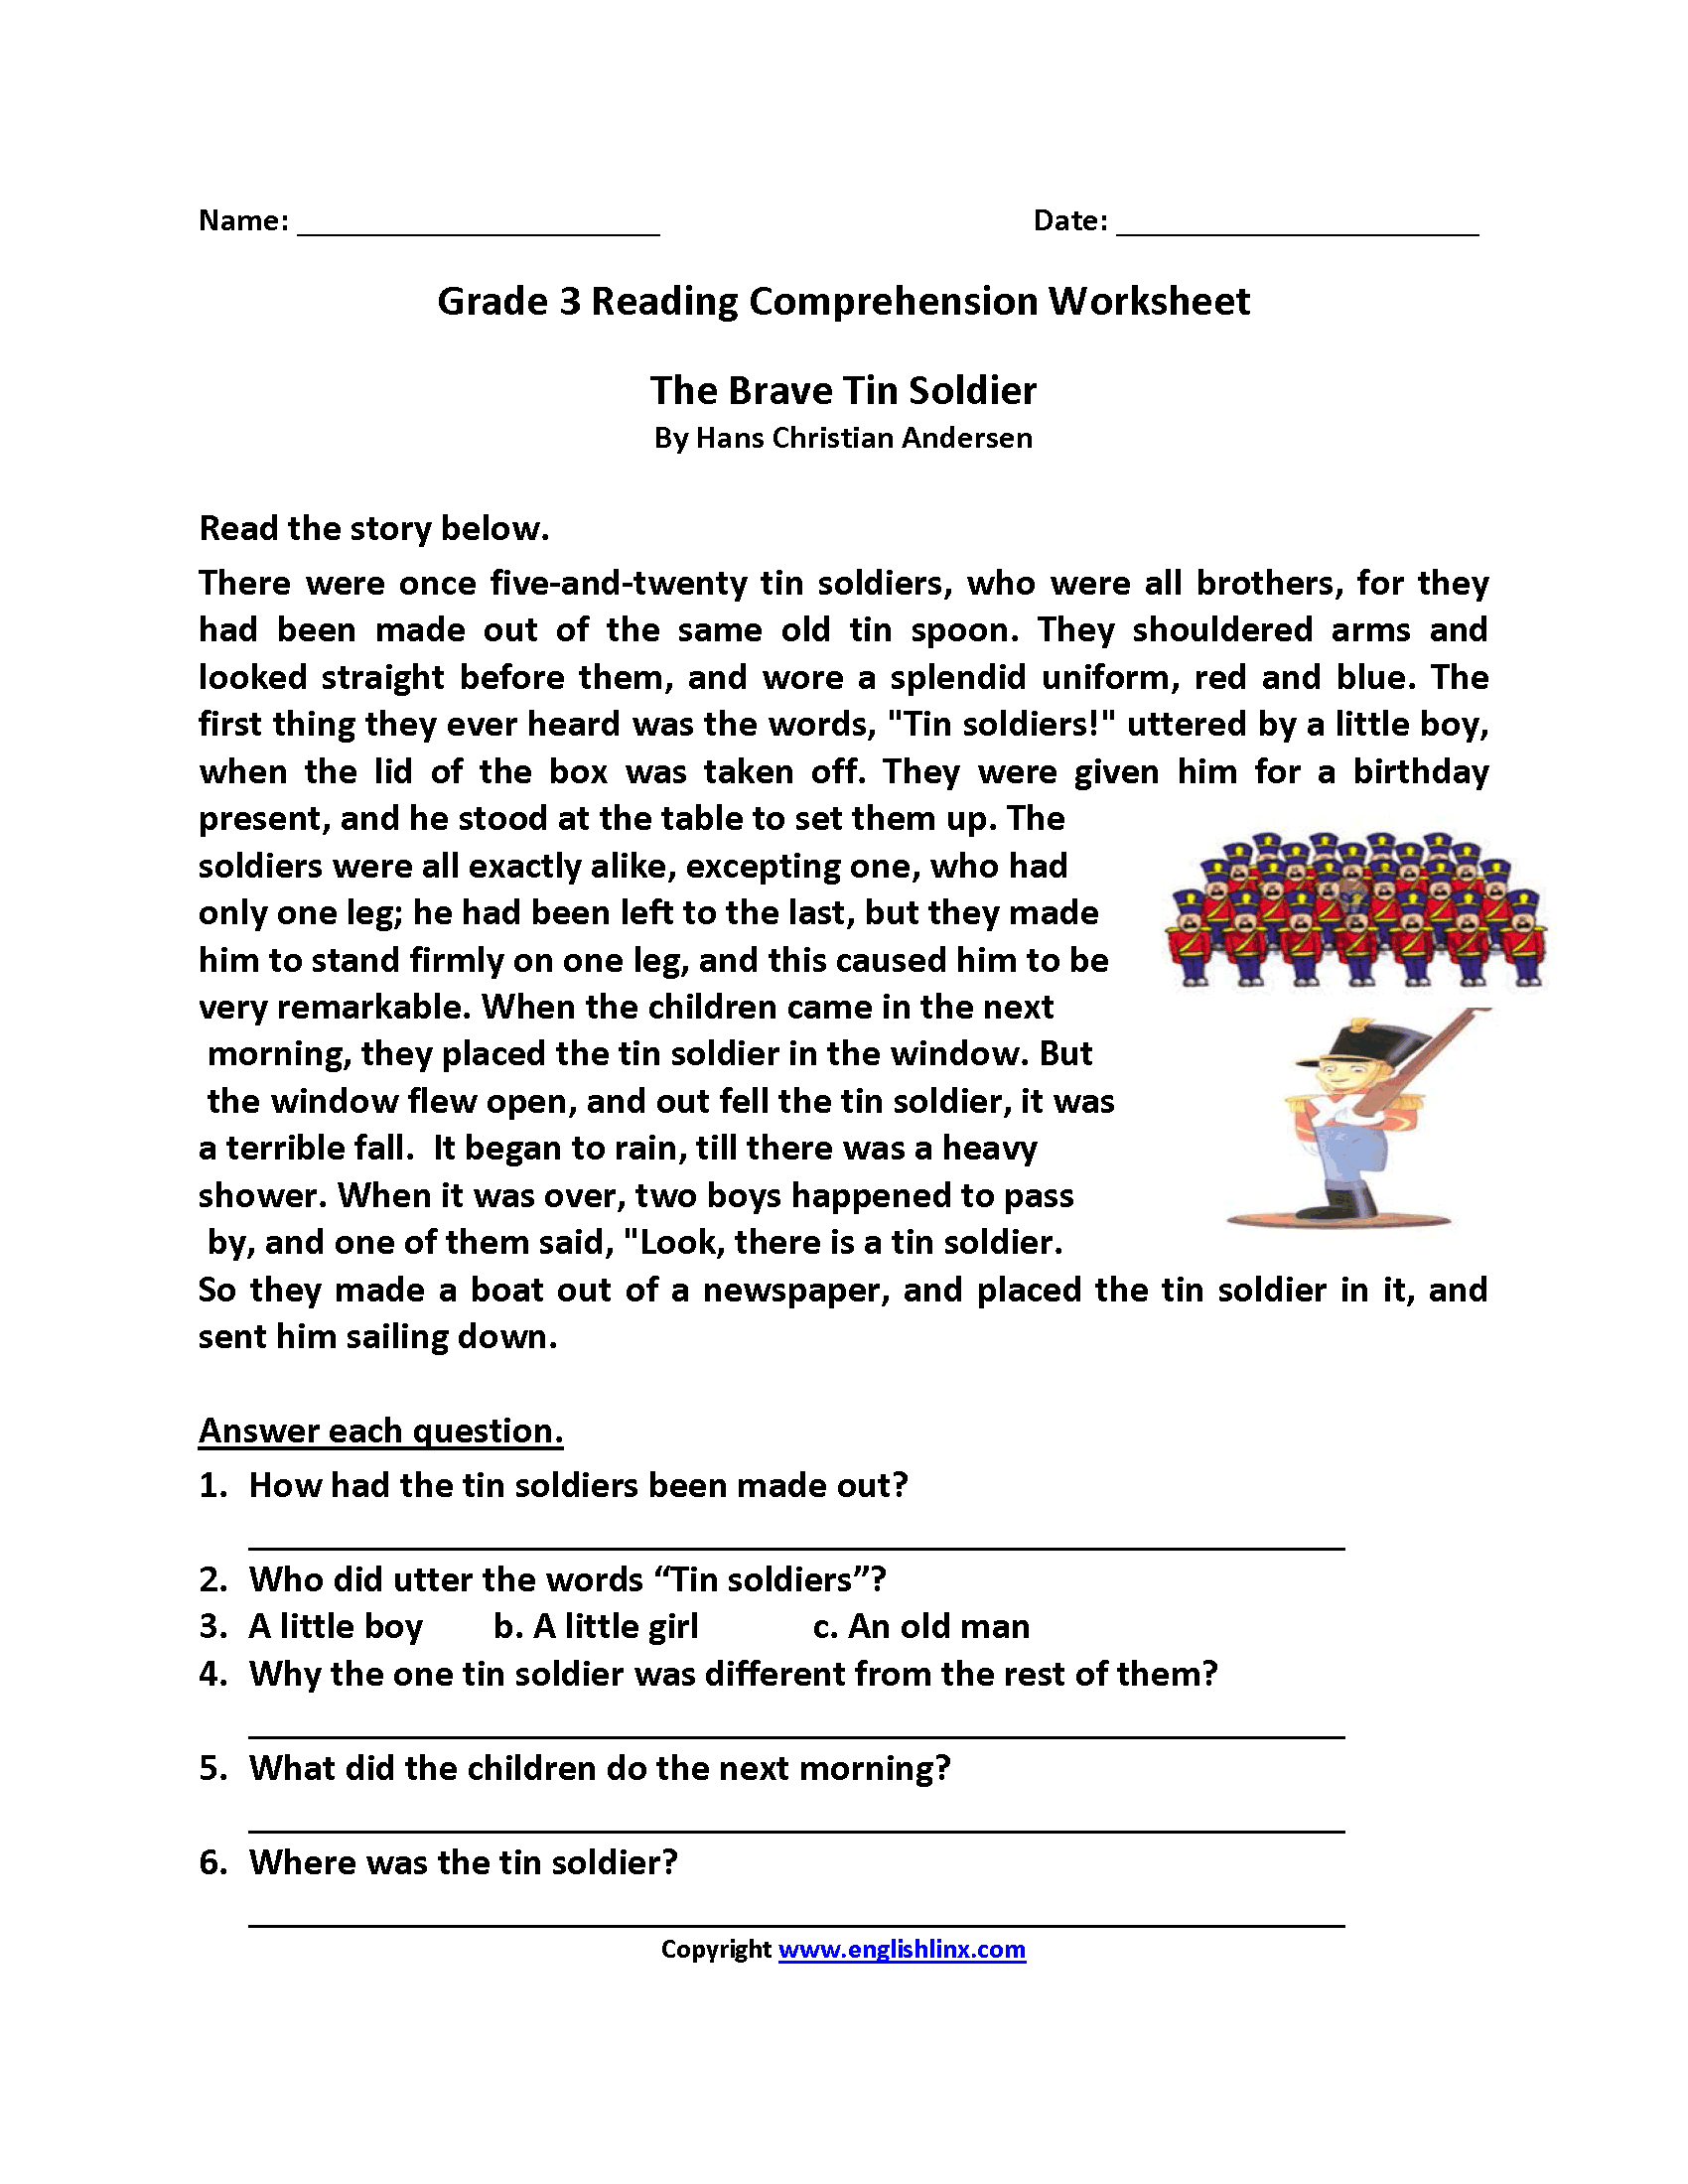 Reading Worksheets | Third Grade Reading Worksheets | Year 3 Literacy Worksheets Printable